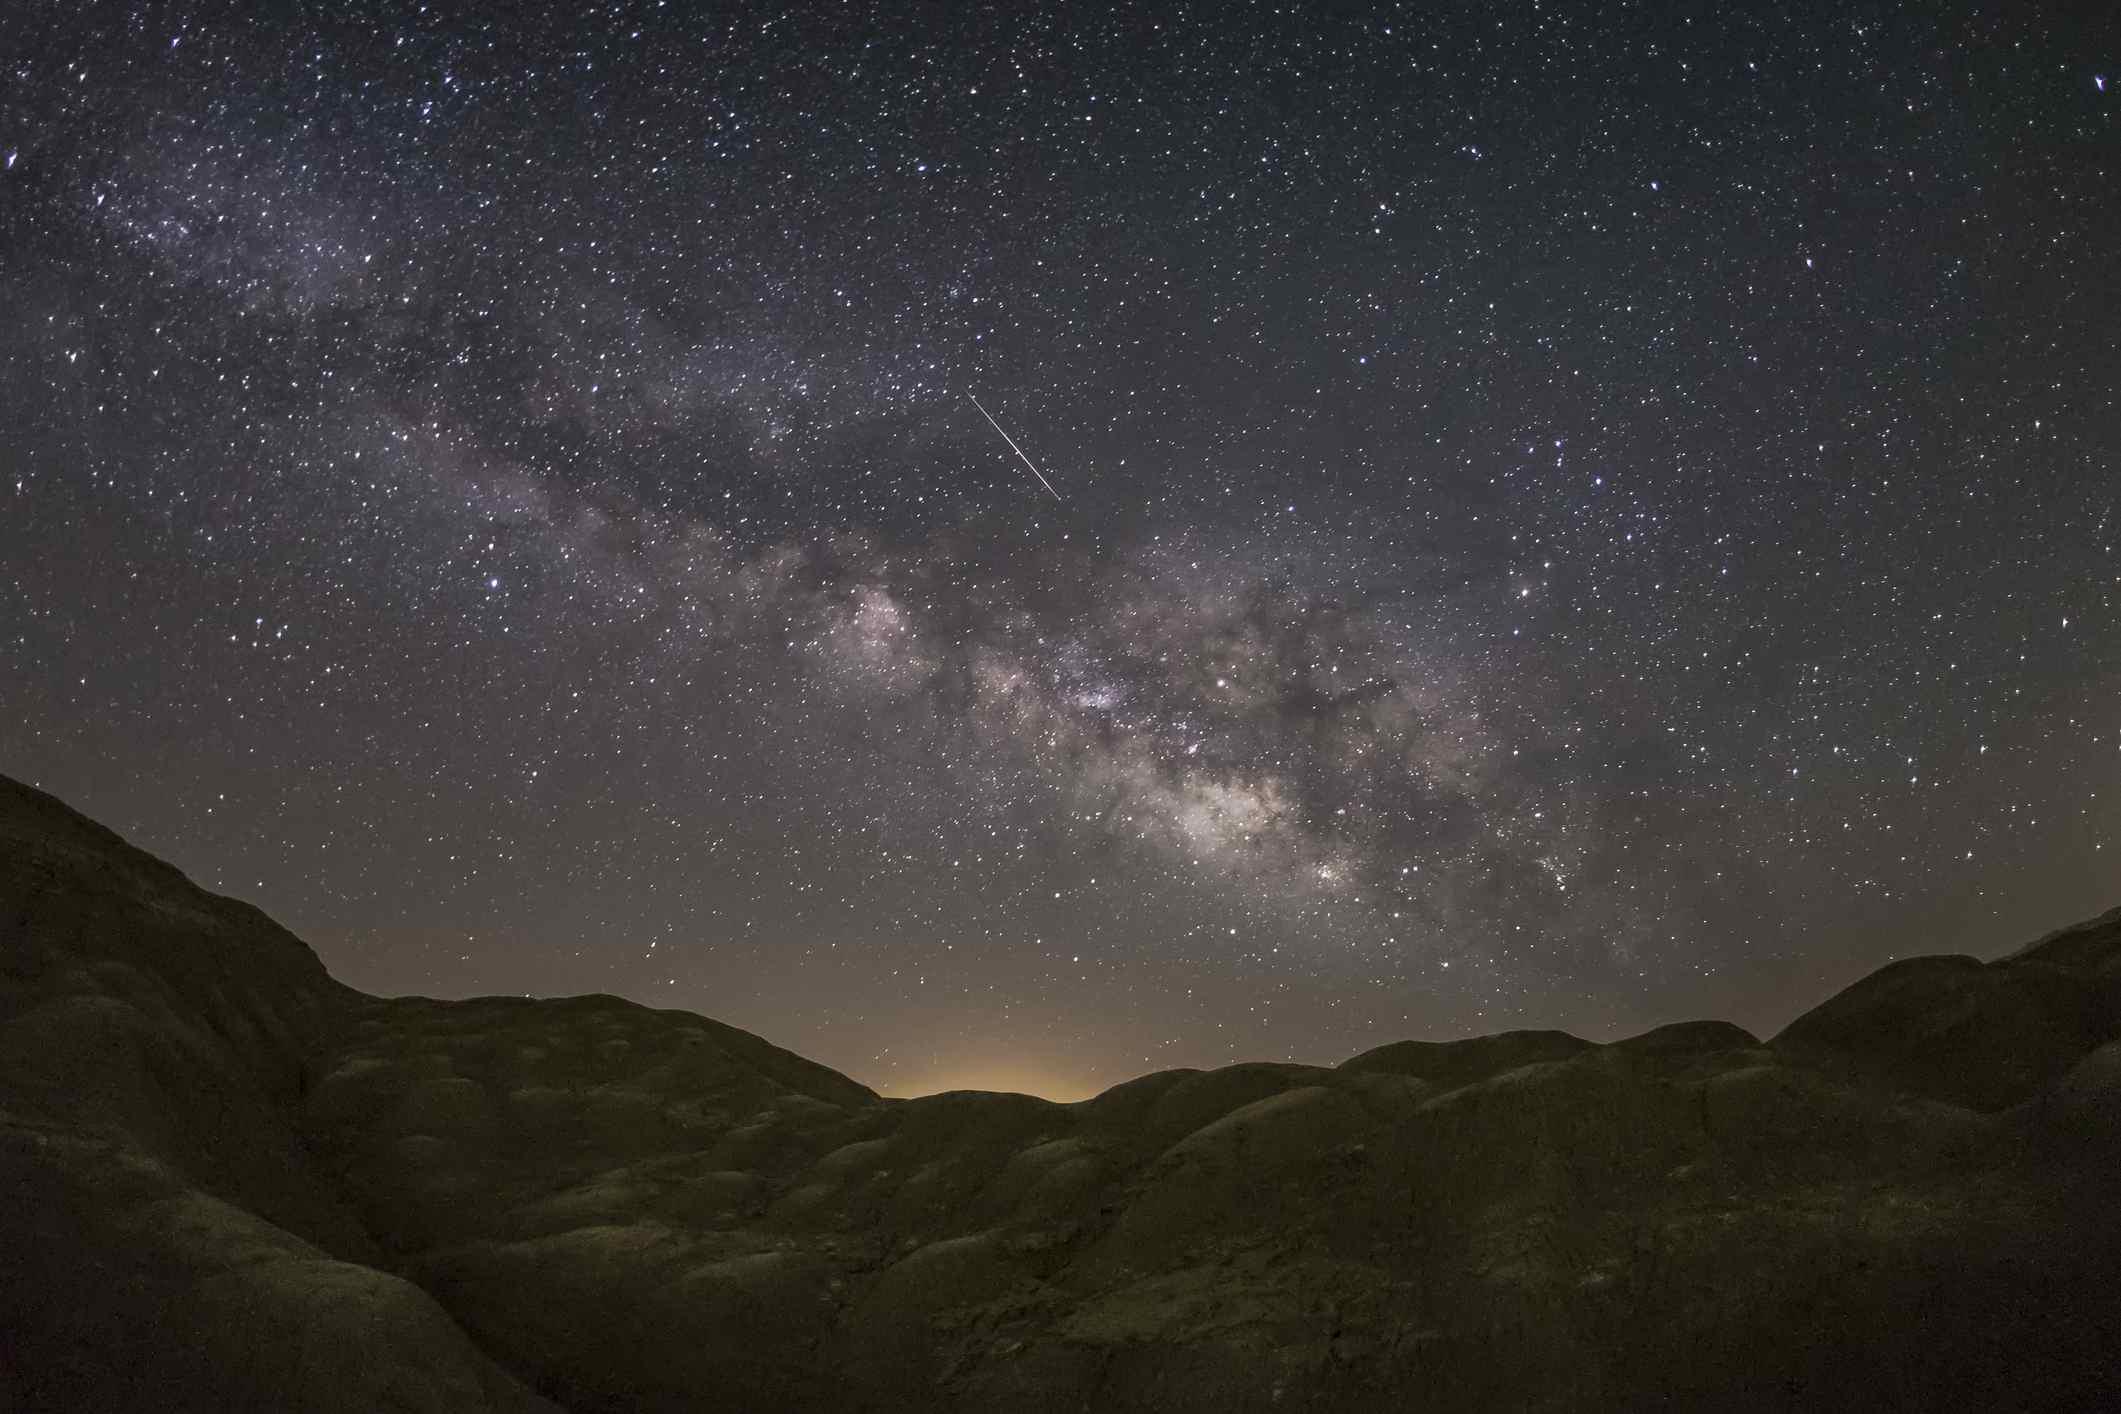 Night sky in the Anza-Borrego Desert in California.